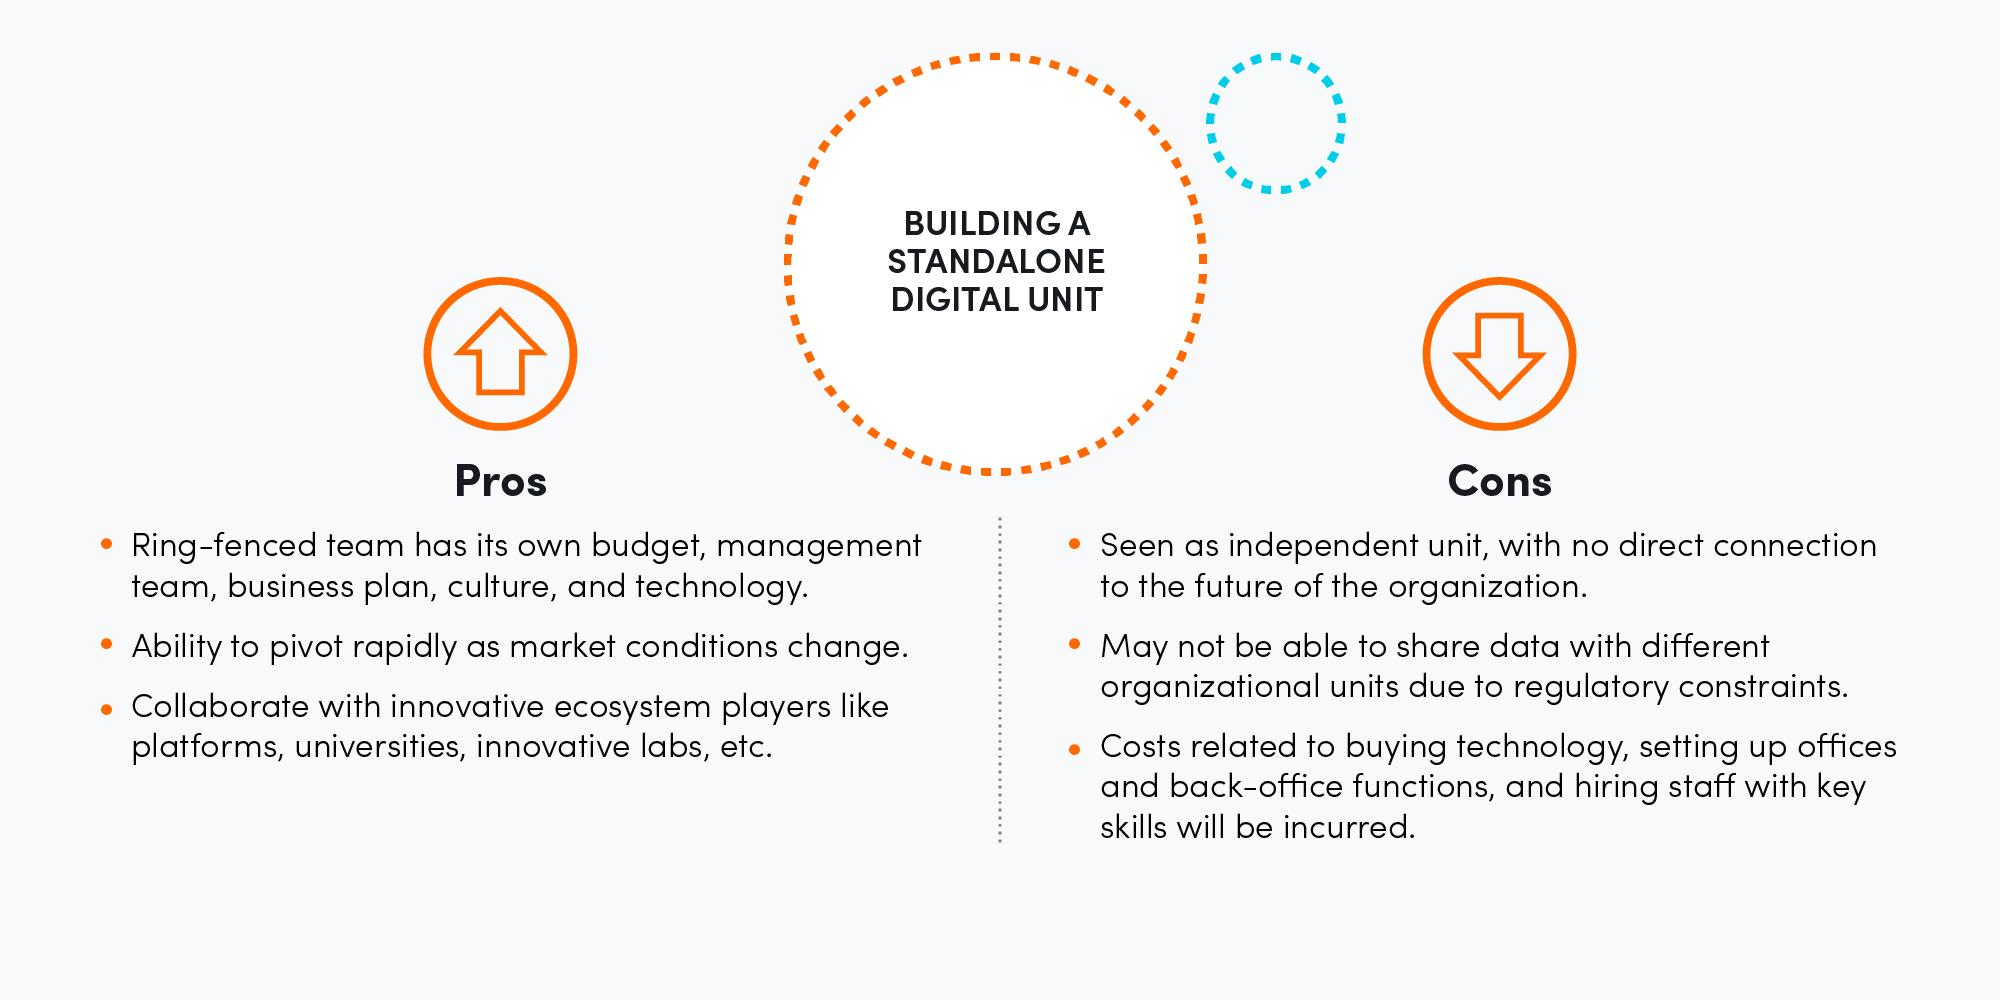 Building a standalone digital unit